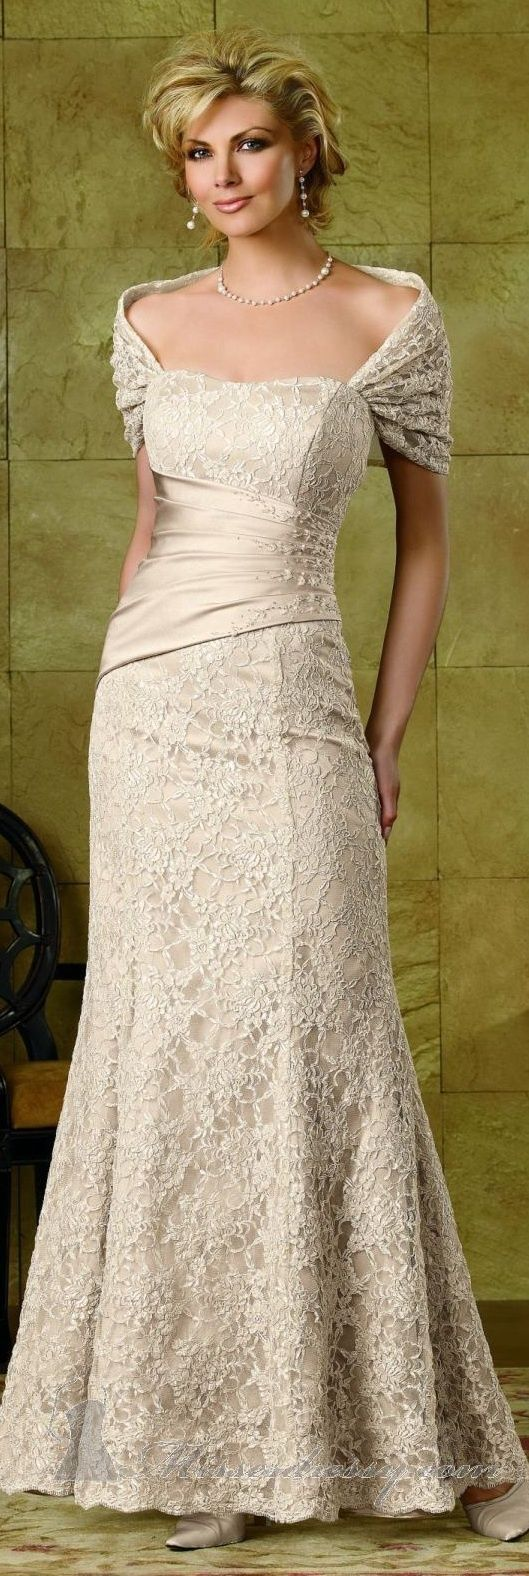 Vestidos modernos para la madre de la novia weddings pinterest